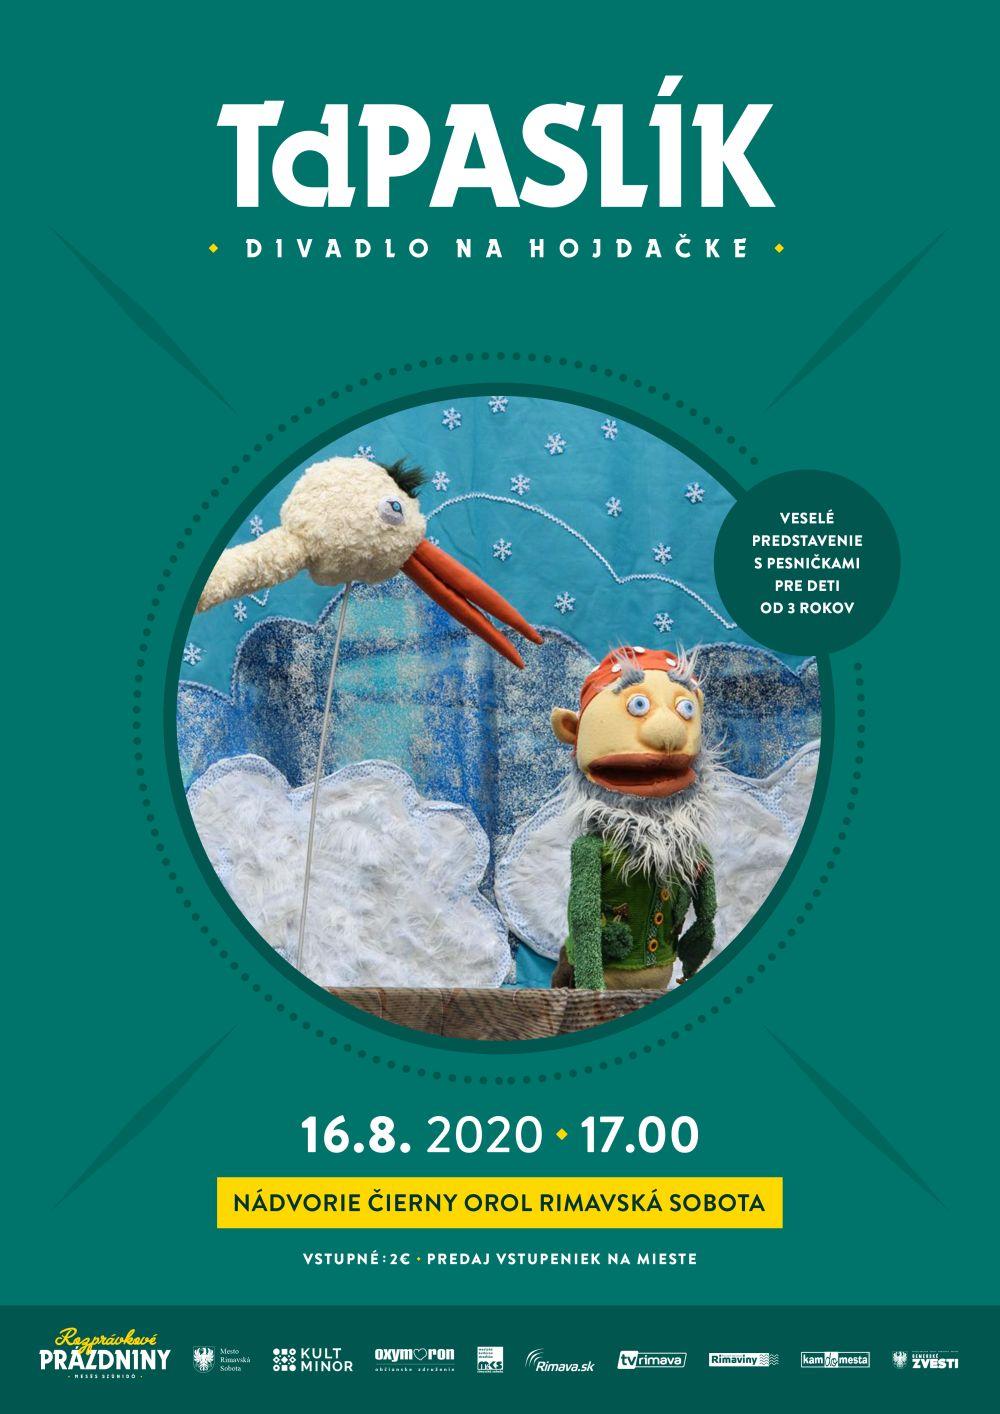 Divadlo na hojdačke: TdPaslík @ Nádvorie Čierny orol Rimavská Sobota